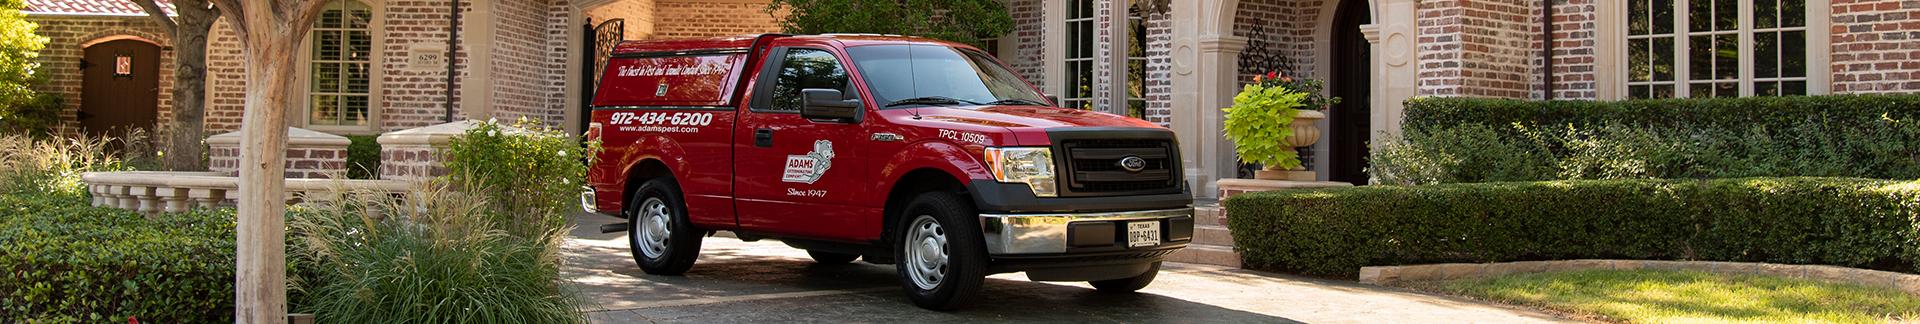 adams pest control's truck in garland tx